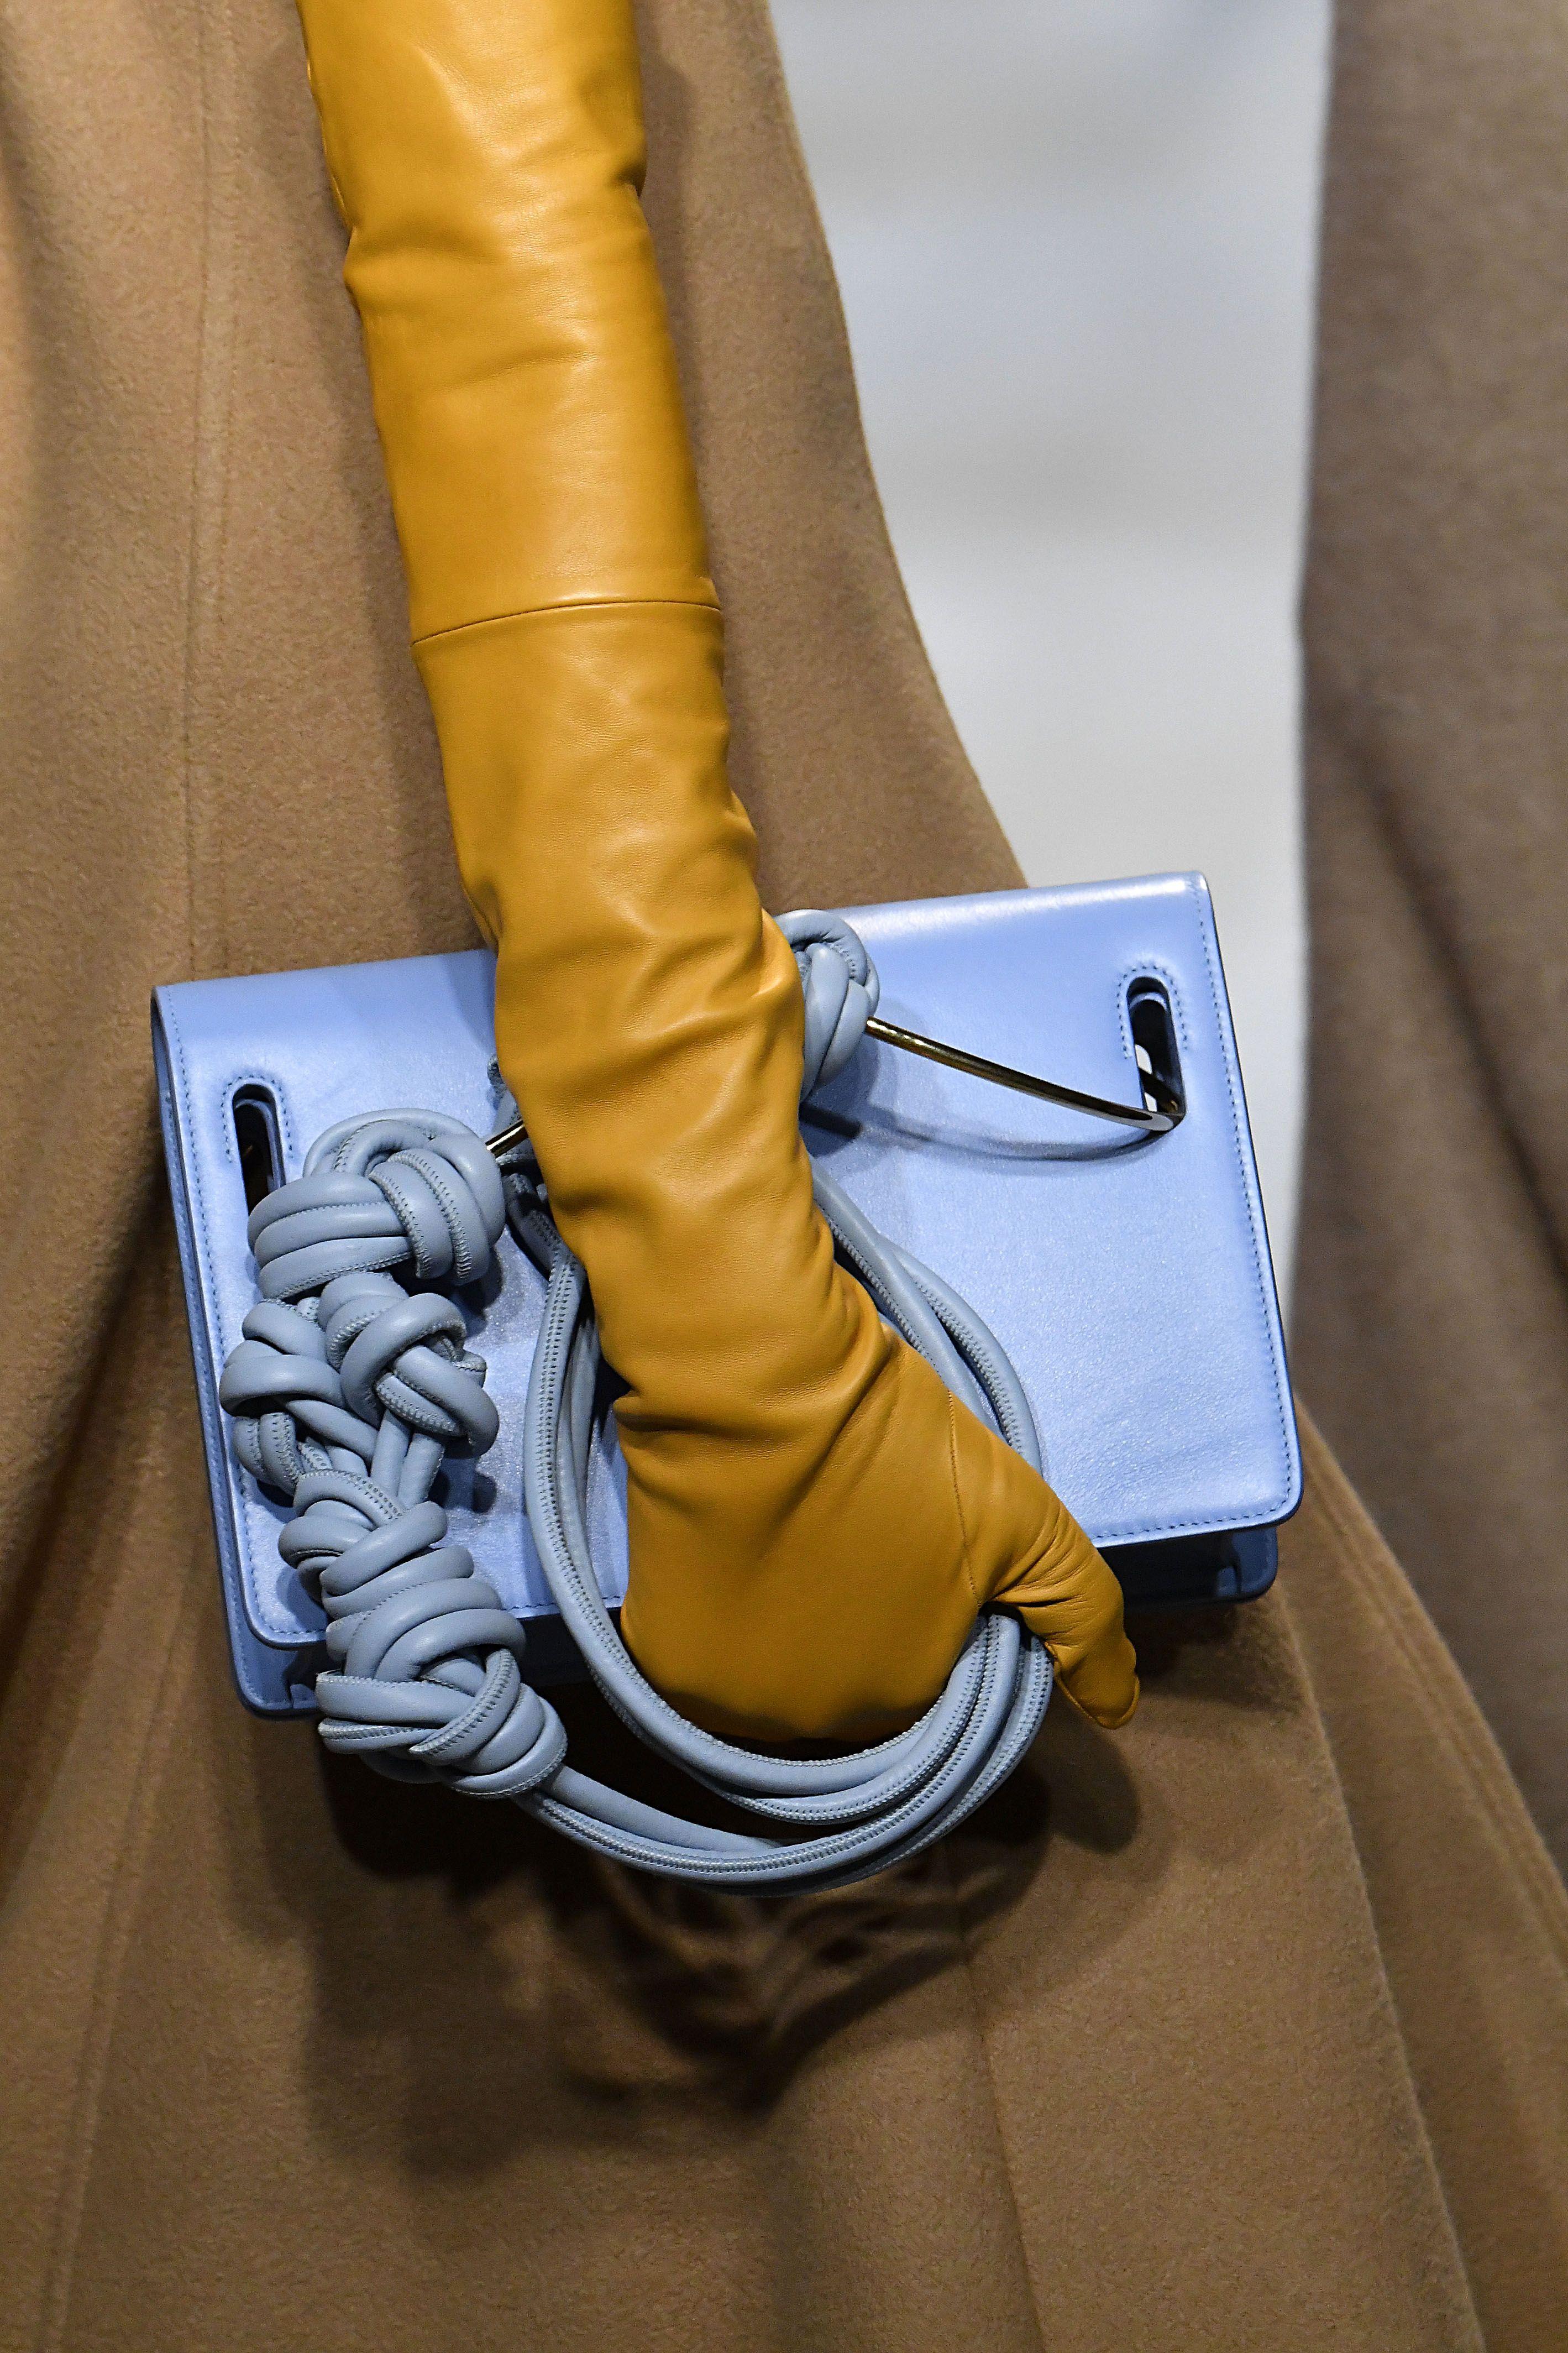 Fall winter handschoenen trends 2018/2019